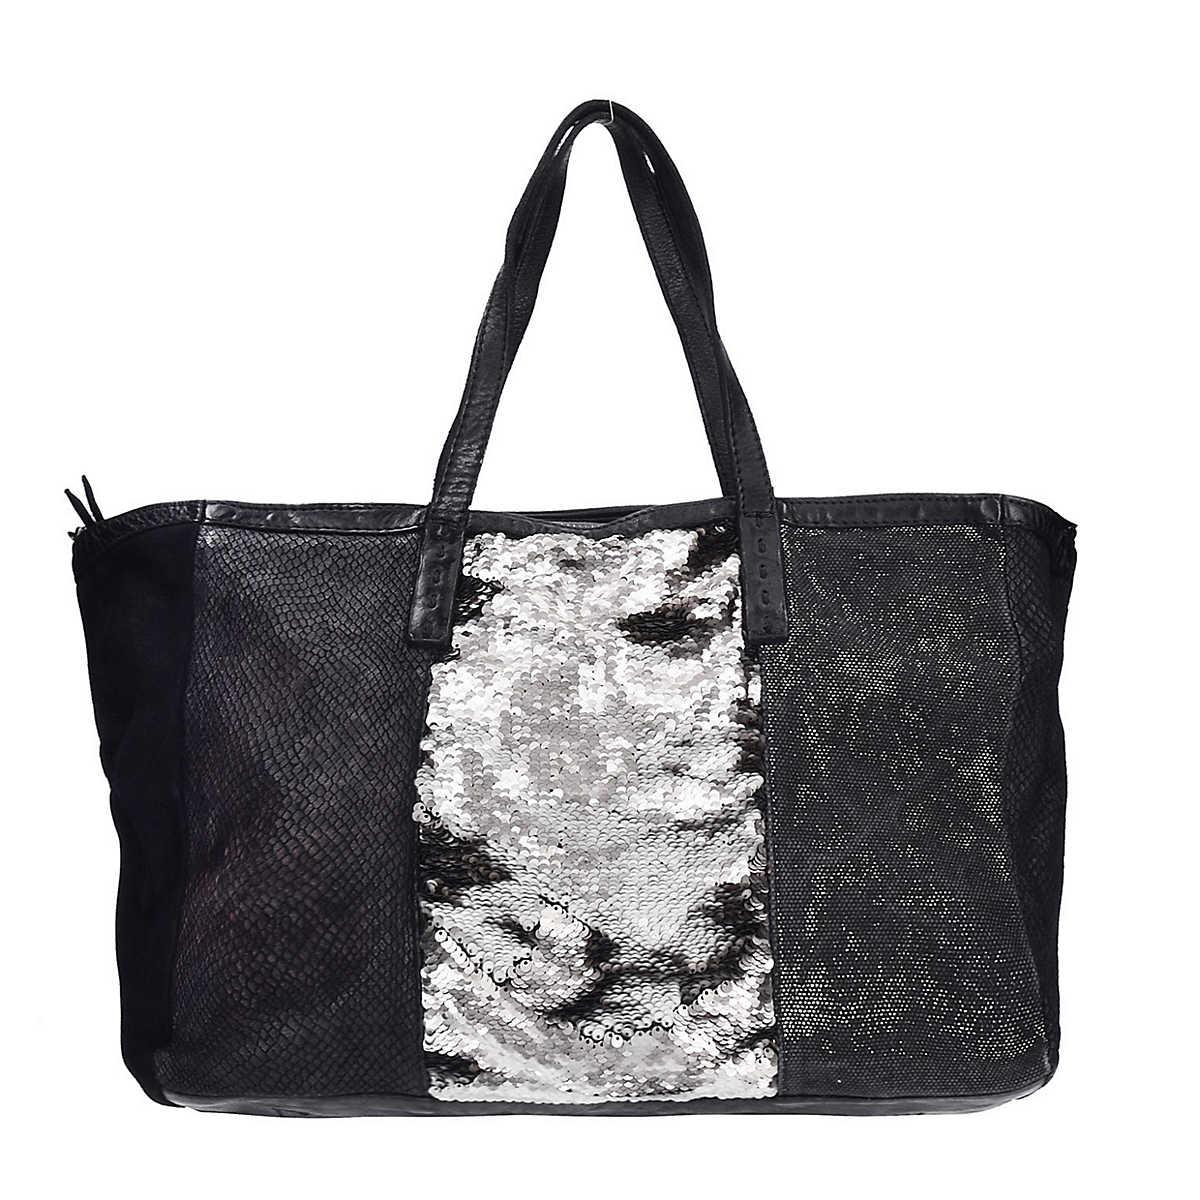 Caterina Lucchi Shopper Tasche Leder 37 cm silber - Caterina Lucchi - Shopper - Taschen - mirapodo.de